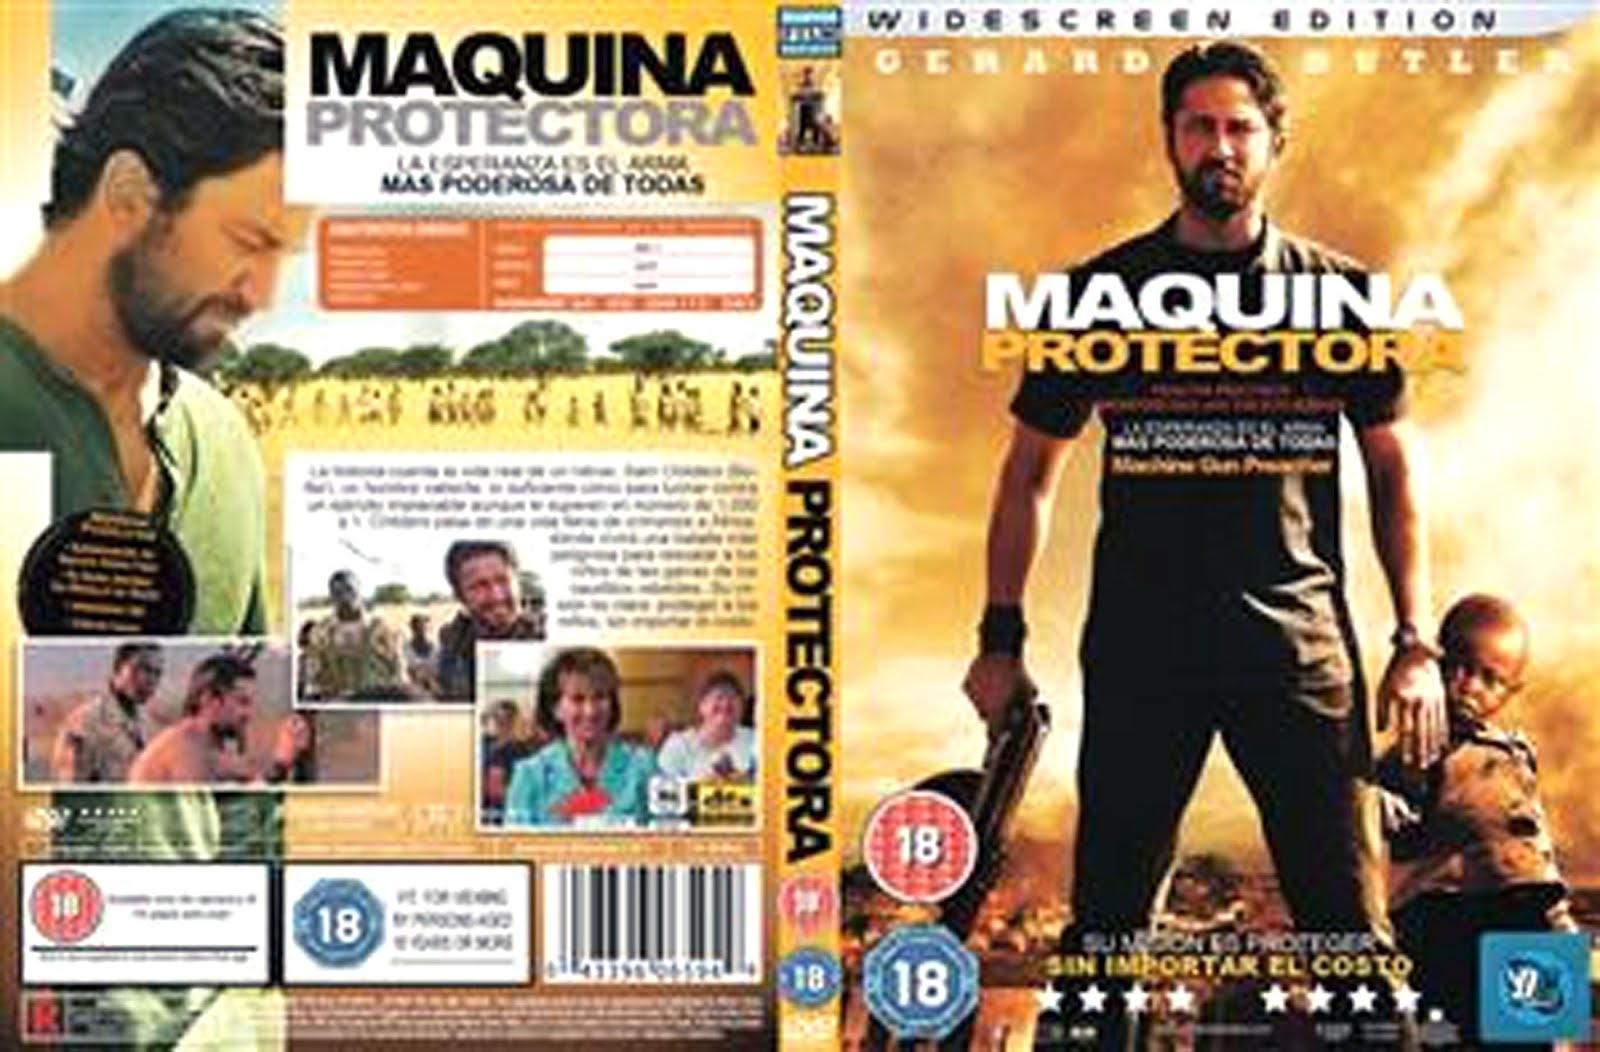 Maquina Protectora Machine Gun Preacher DVD Cover